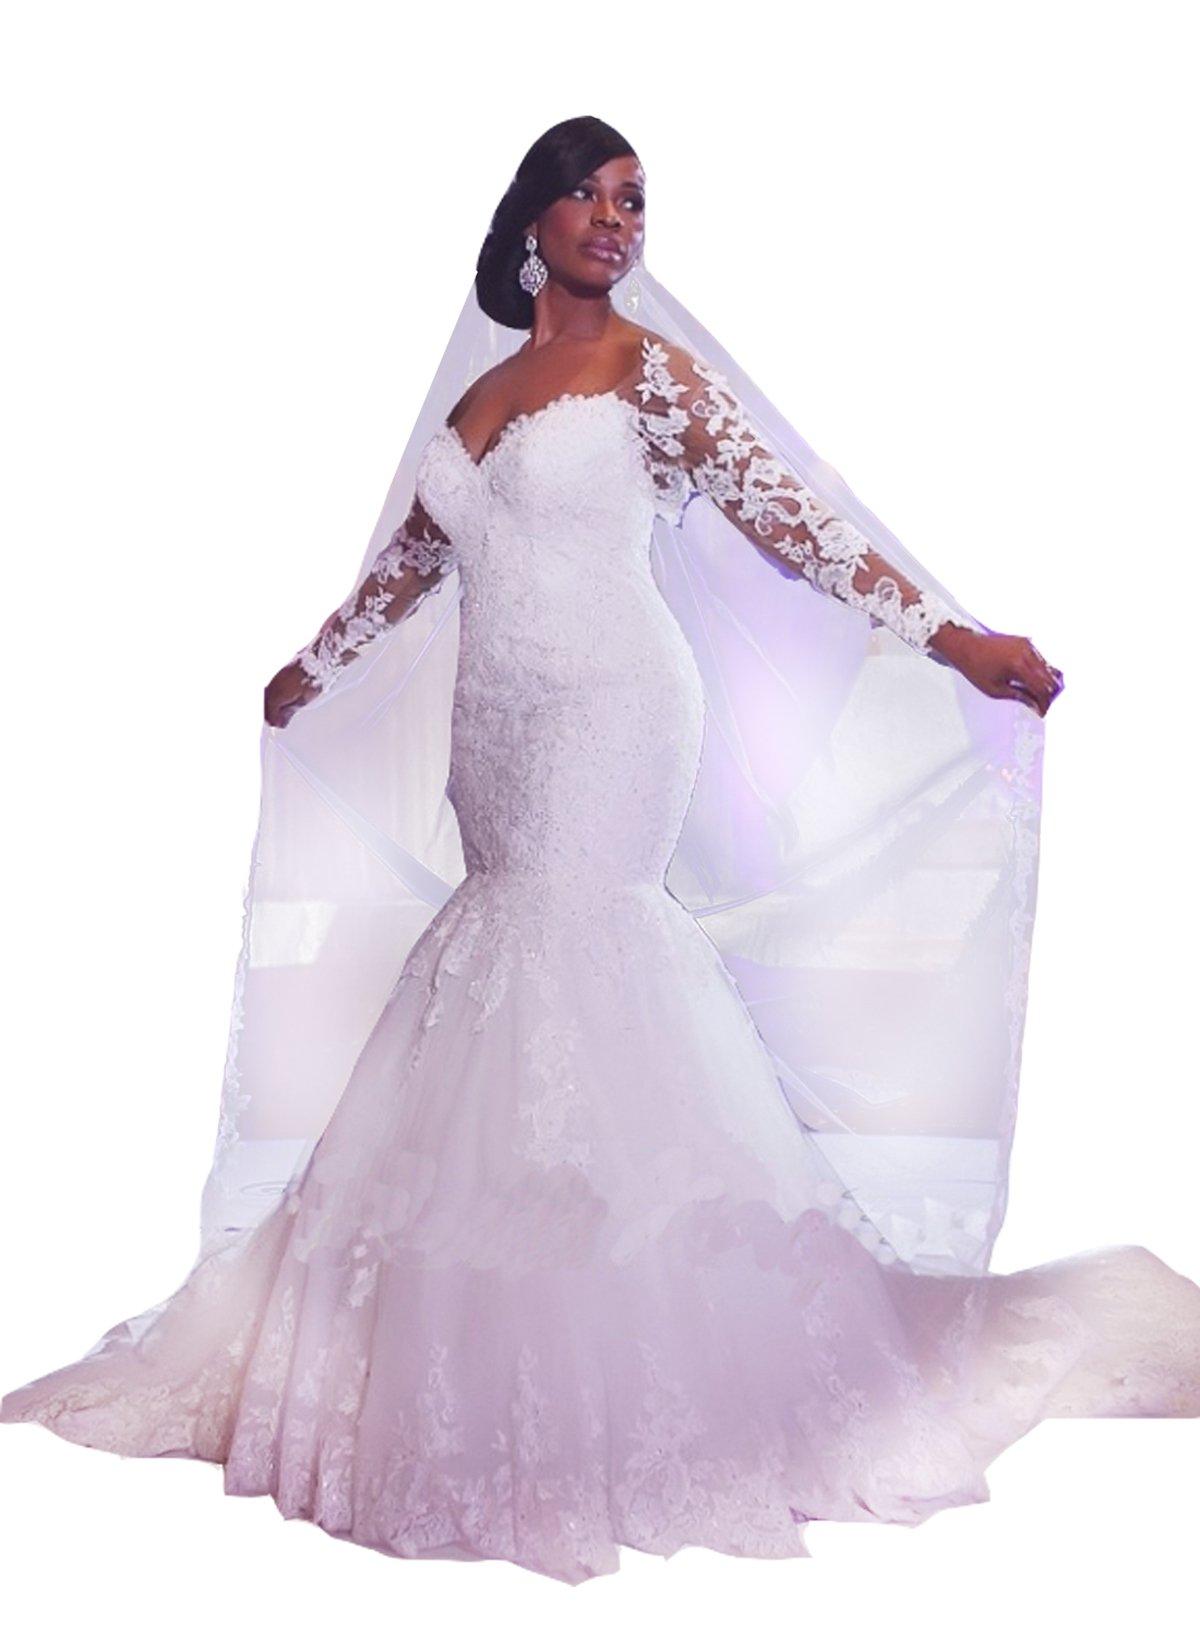 Diandiai Women Long Sleeve Lace Wedding Dresses Plus Size Mermaid Wedding  Dress White 18